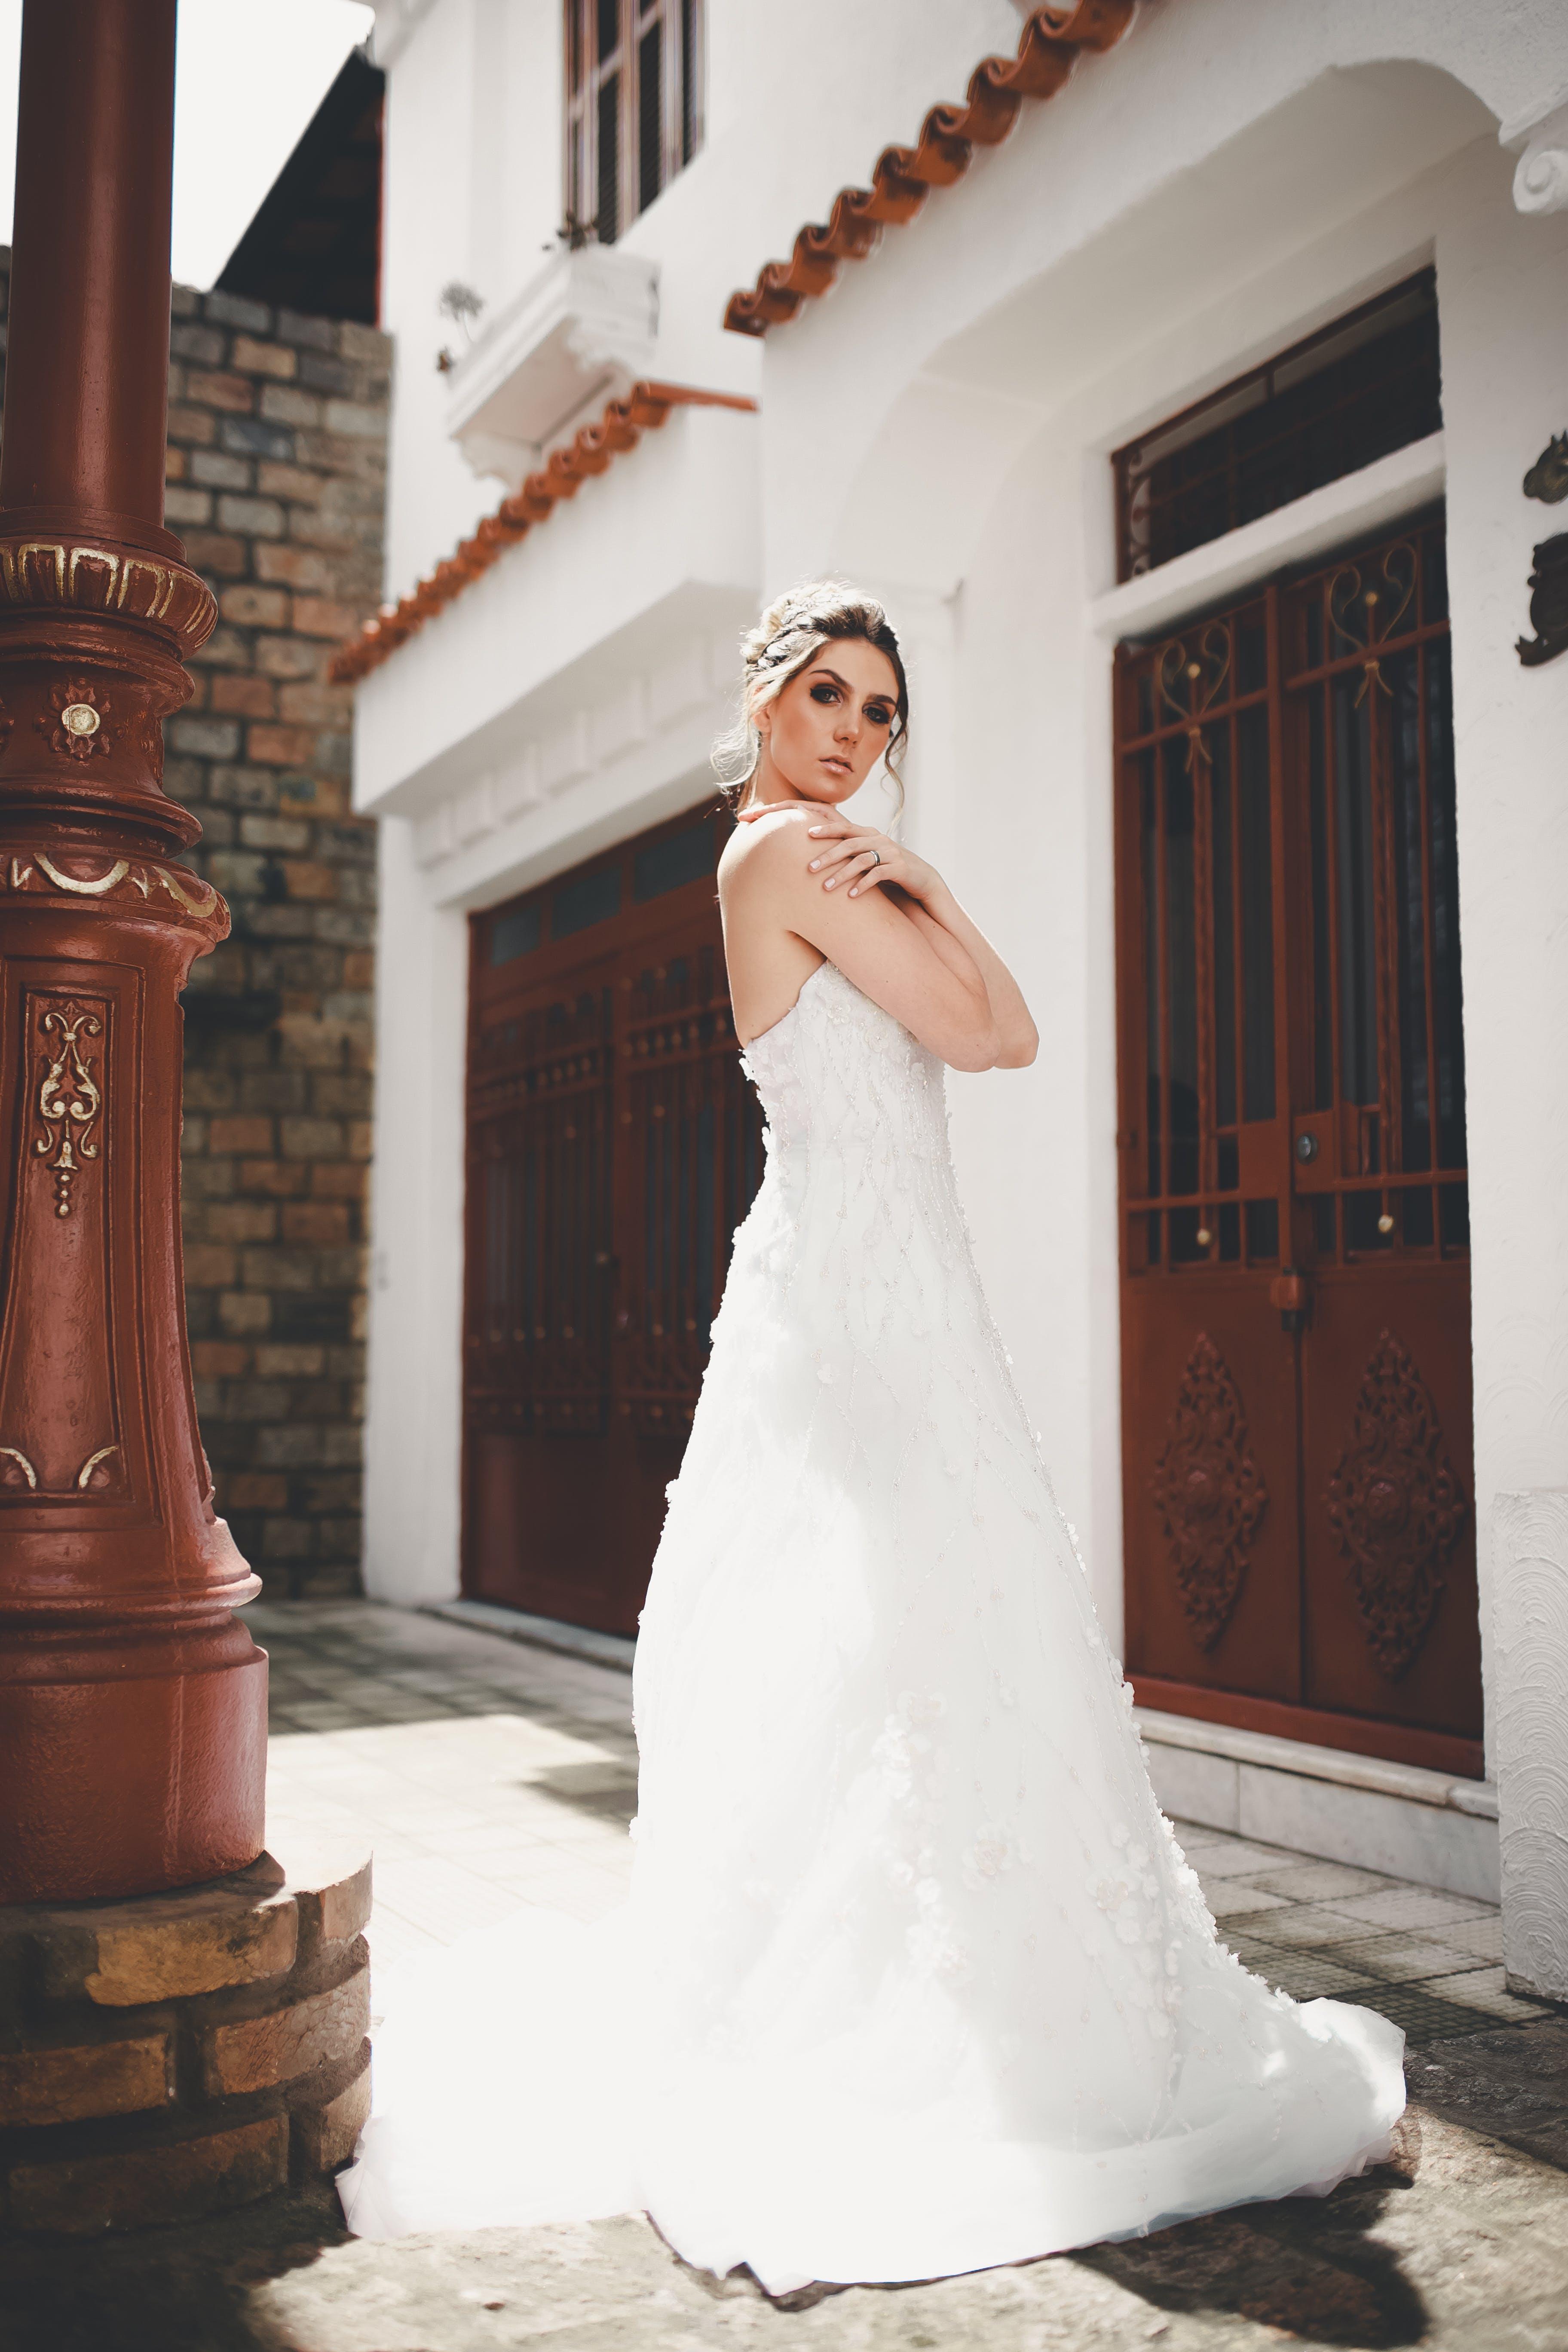 Woman Taking Pose in Her Wedding Dress